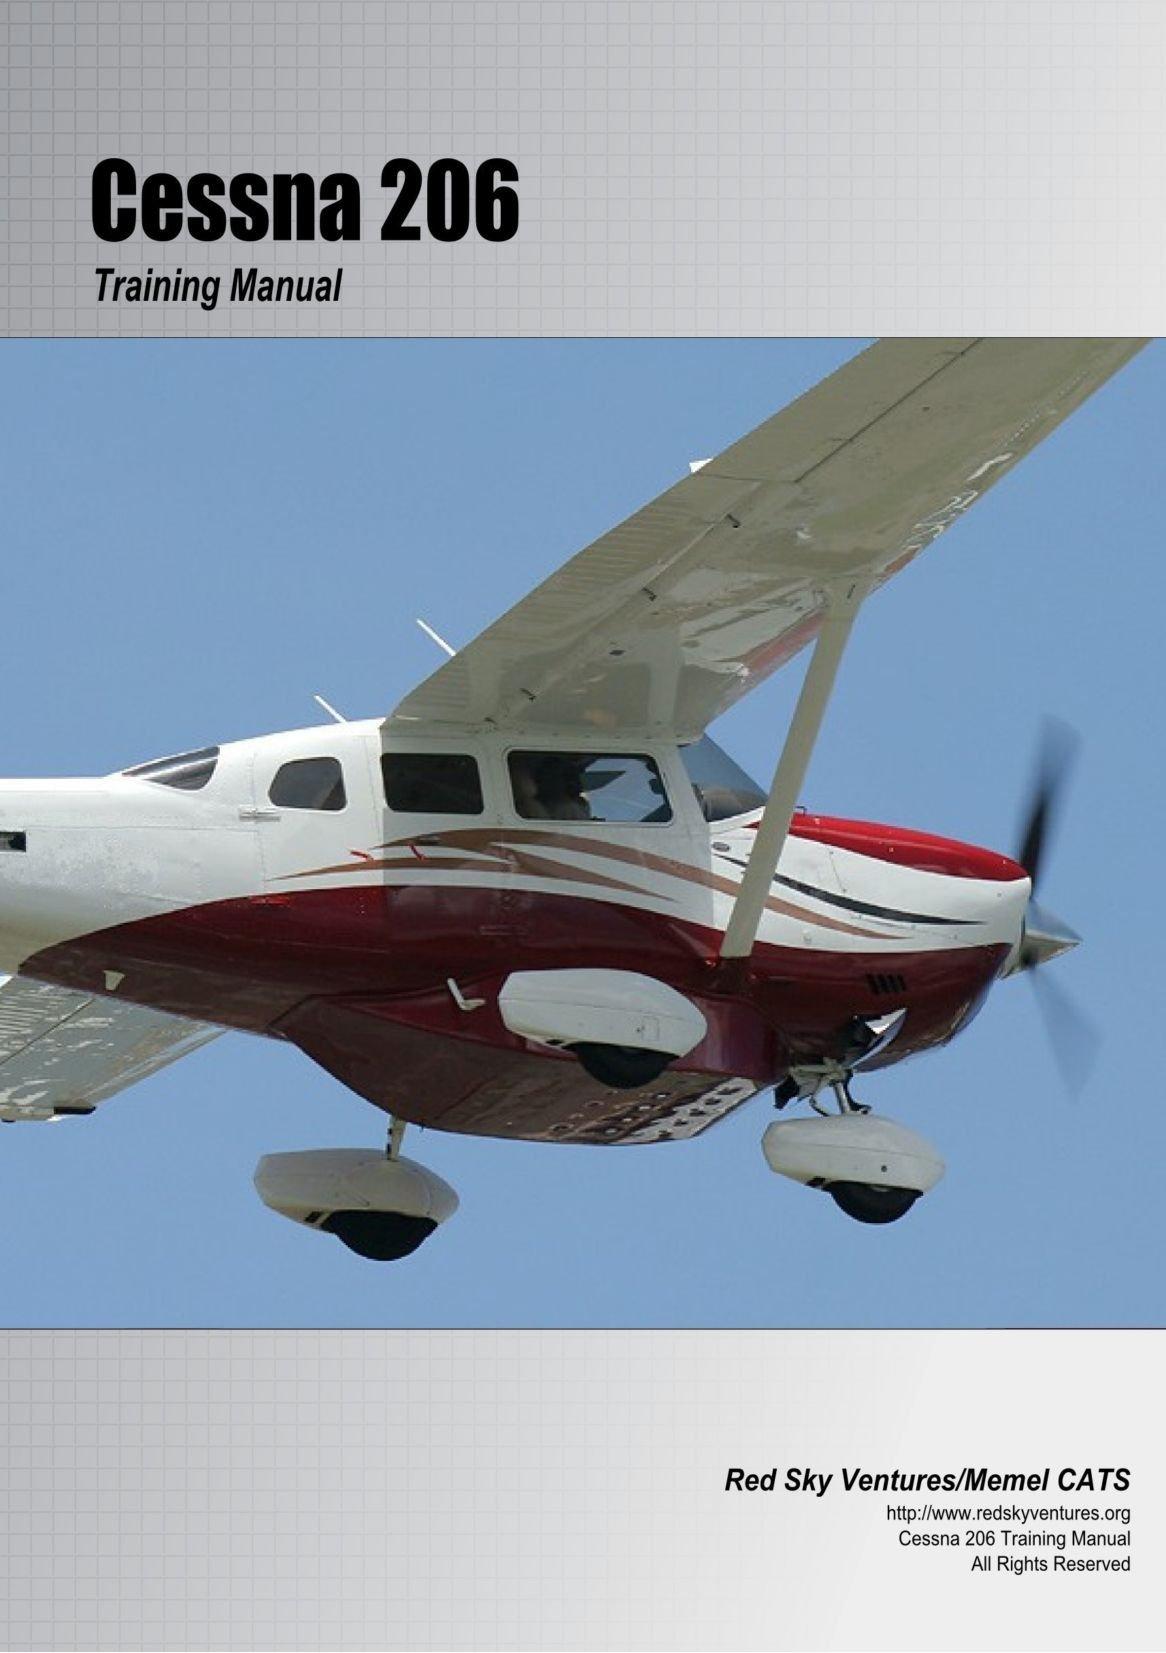 Cessna 206 Training Manual: Danielle Bruckert, Oleg Roud: 9781456376505:  Amazon.com: Books